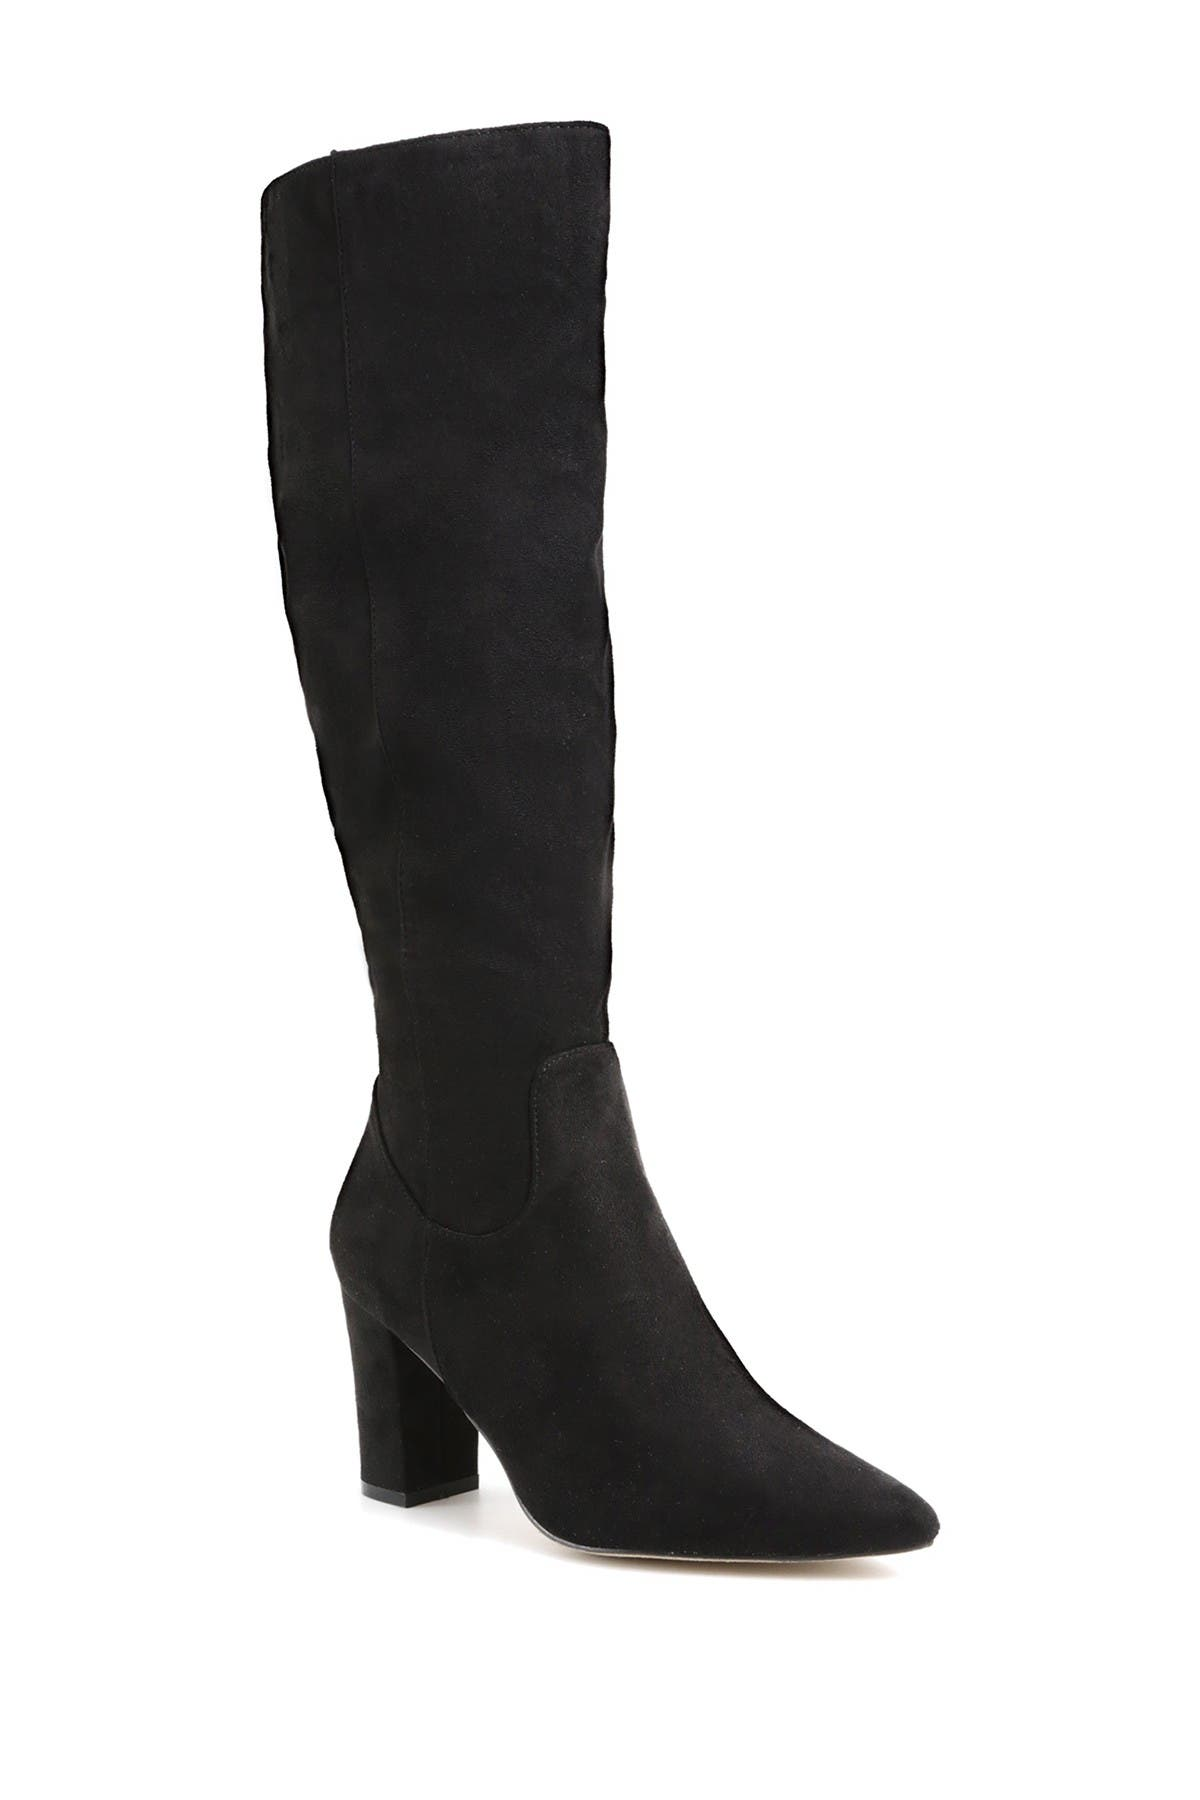 Image of Catherine Catherine Malandrino Dunno Block Heel Boot